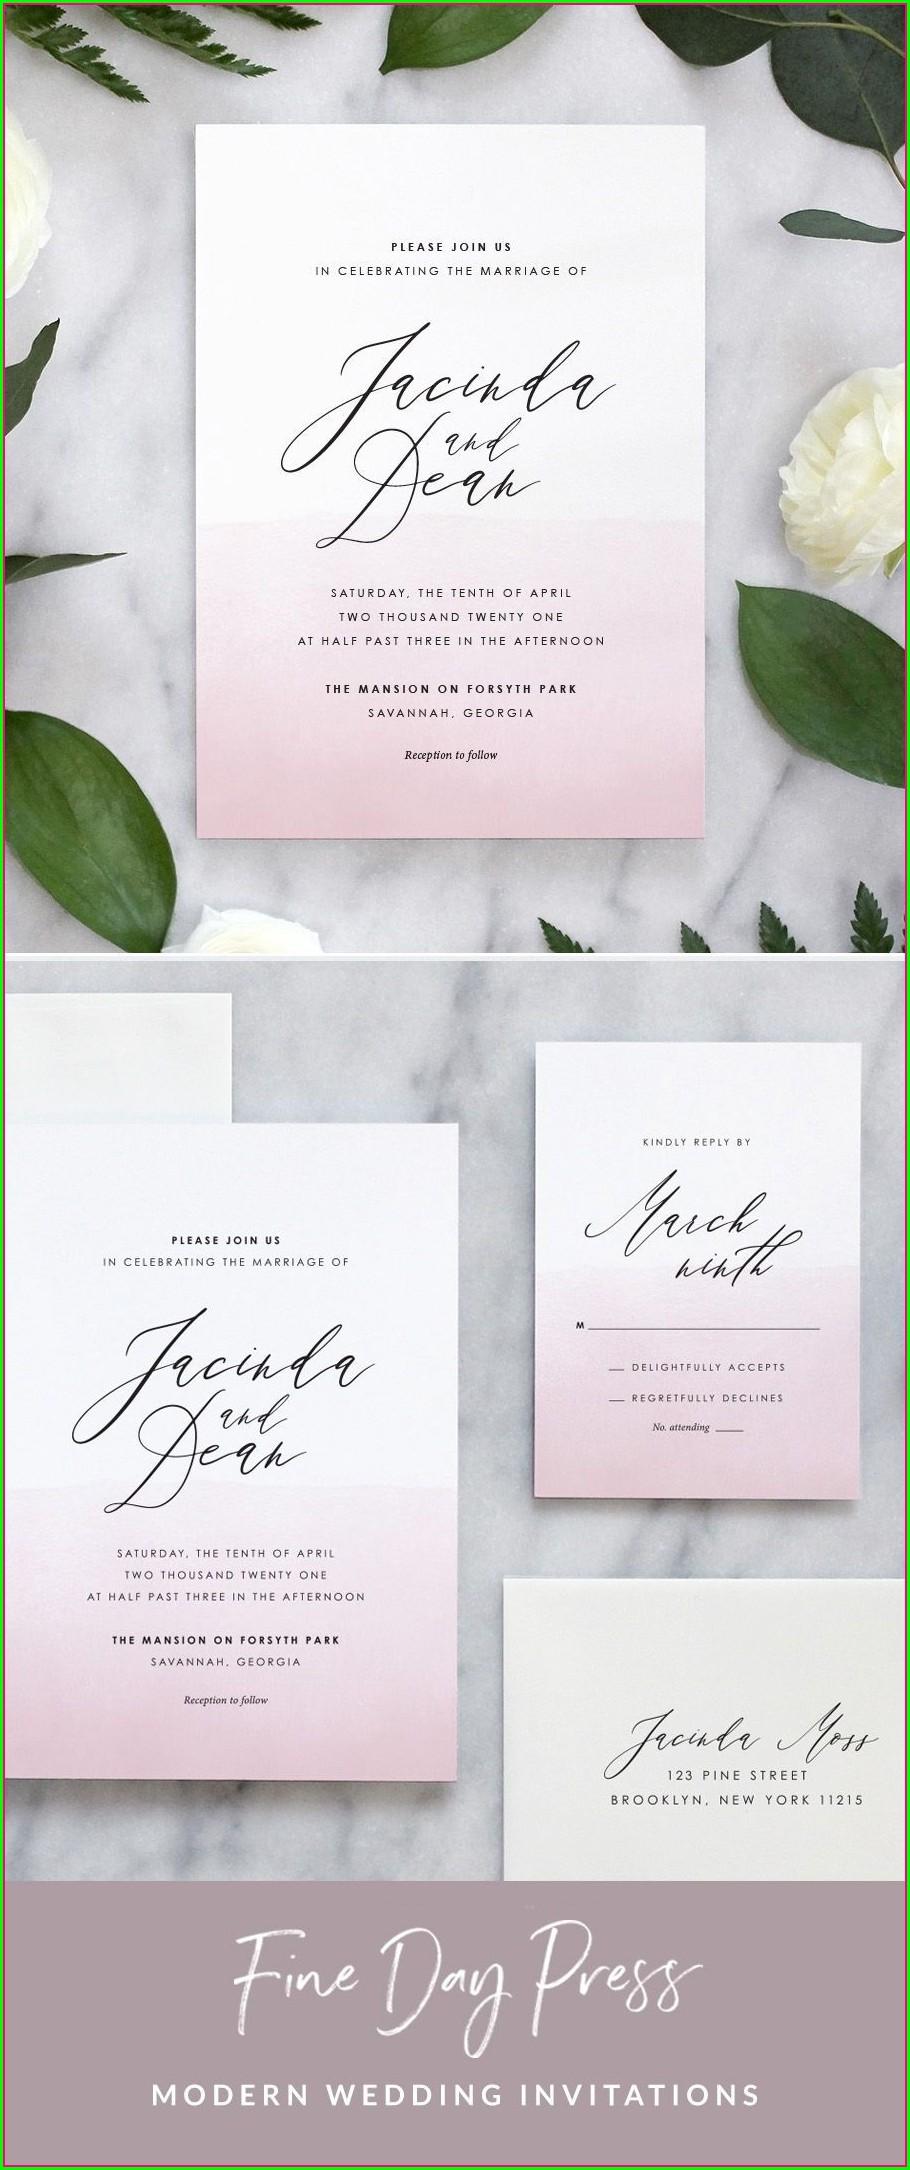 Watercolor Ombre Wedding Invitations